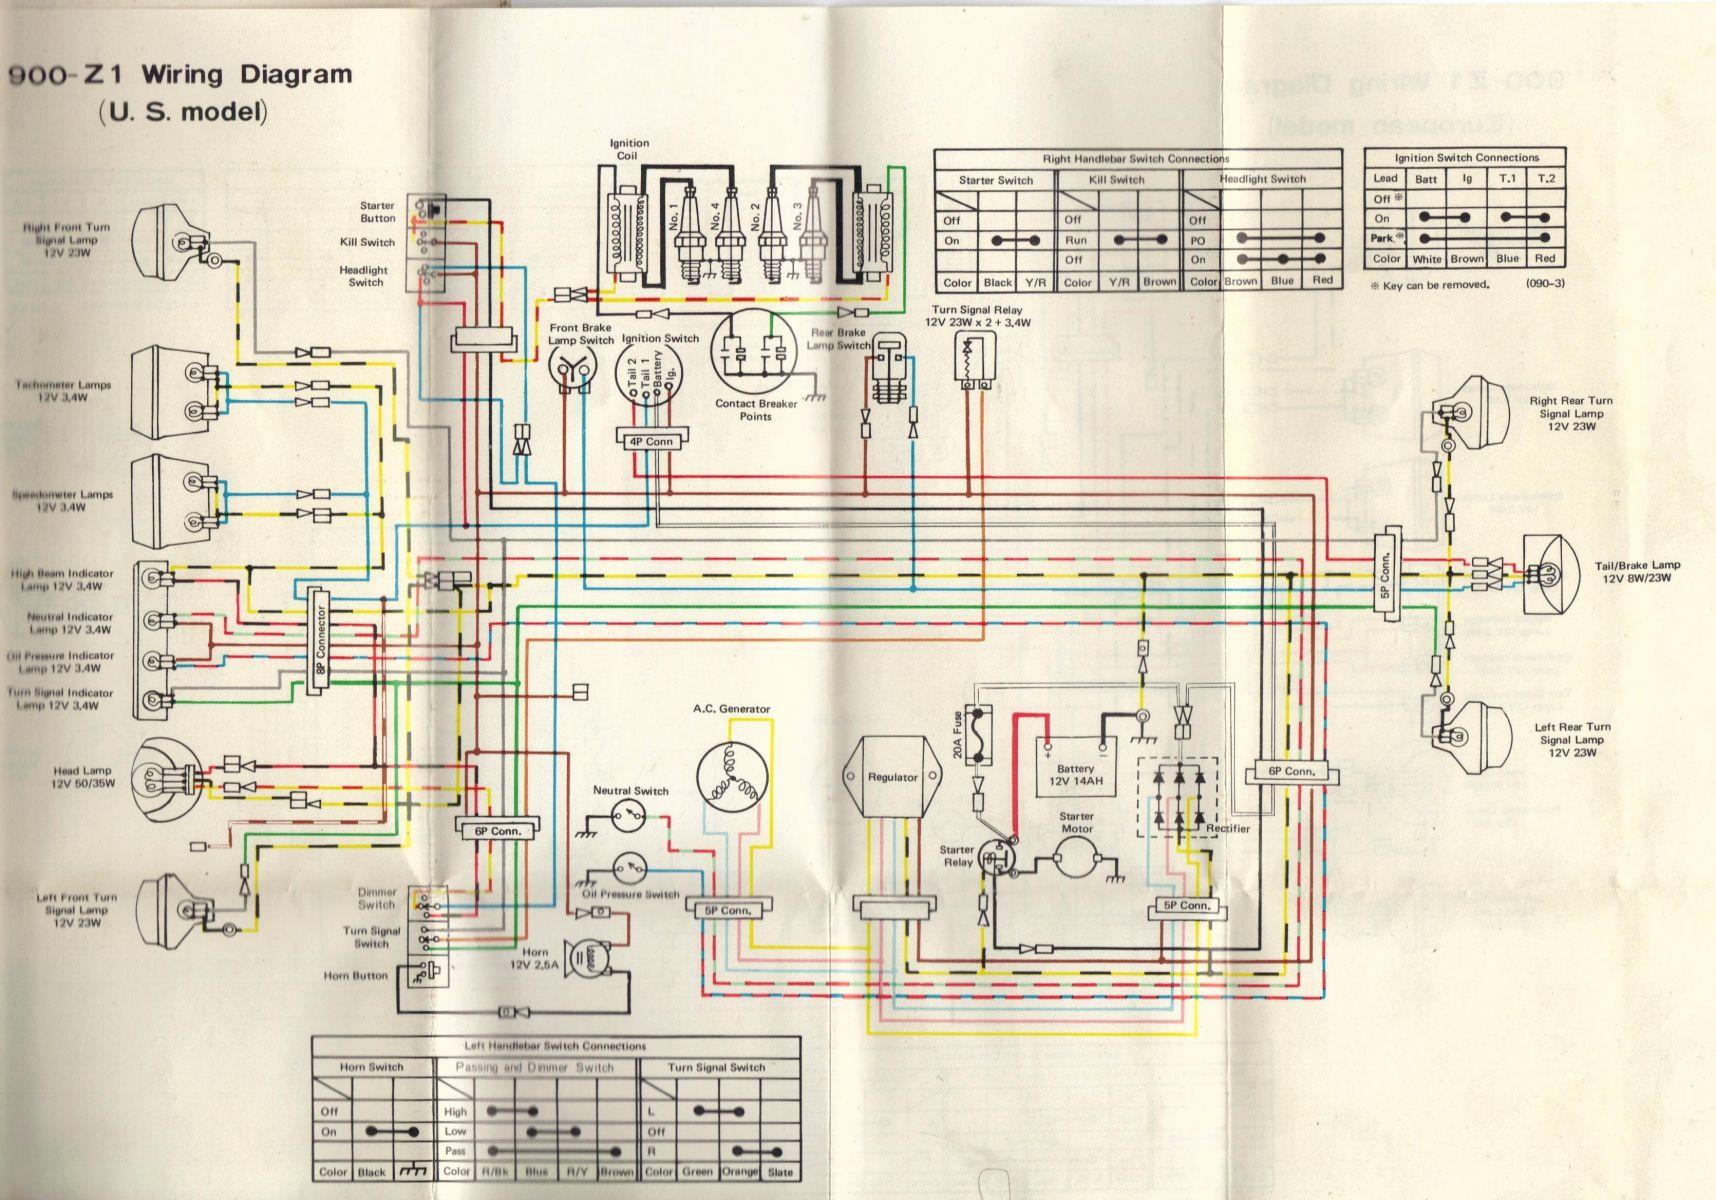 z1wiringdiagram2001 2?resize\=1716%2C1200\&ssl\=1 z1 wiring diagram coleman furnace wiring diagram \u2022 wiring diagrams Philco Model 60 at gsmx.co